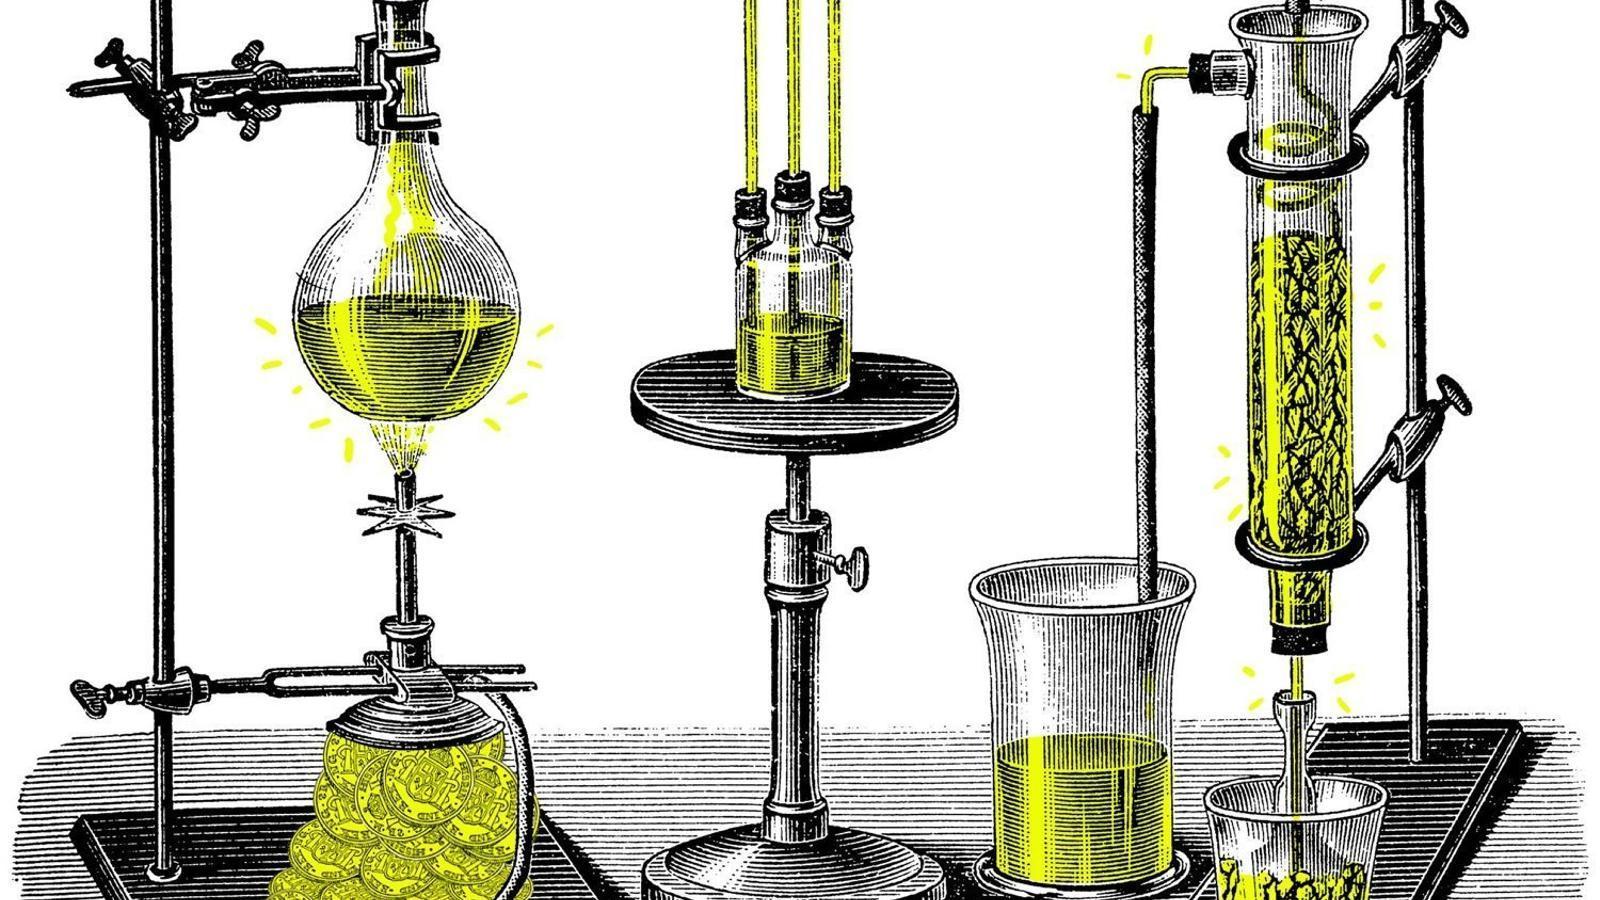 Les 'biotec' catalanes surten del laboratori